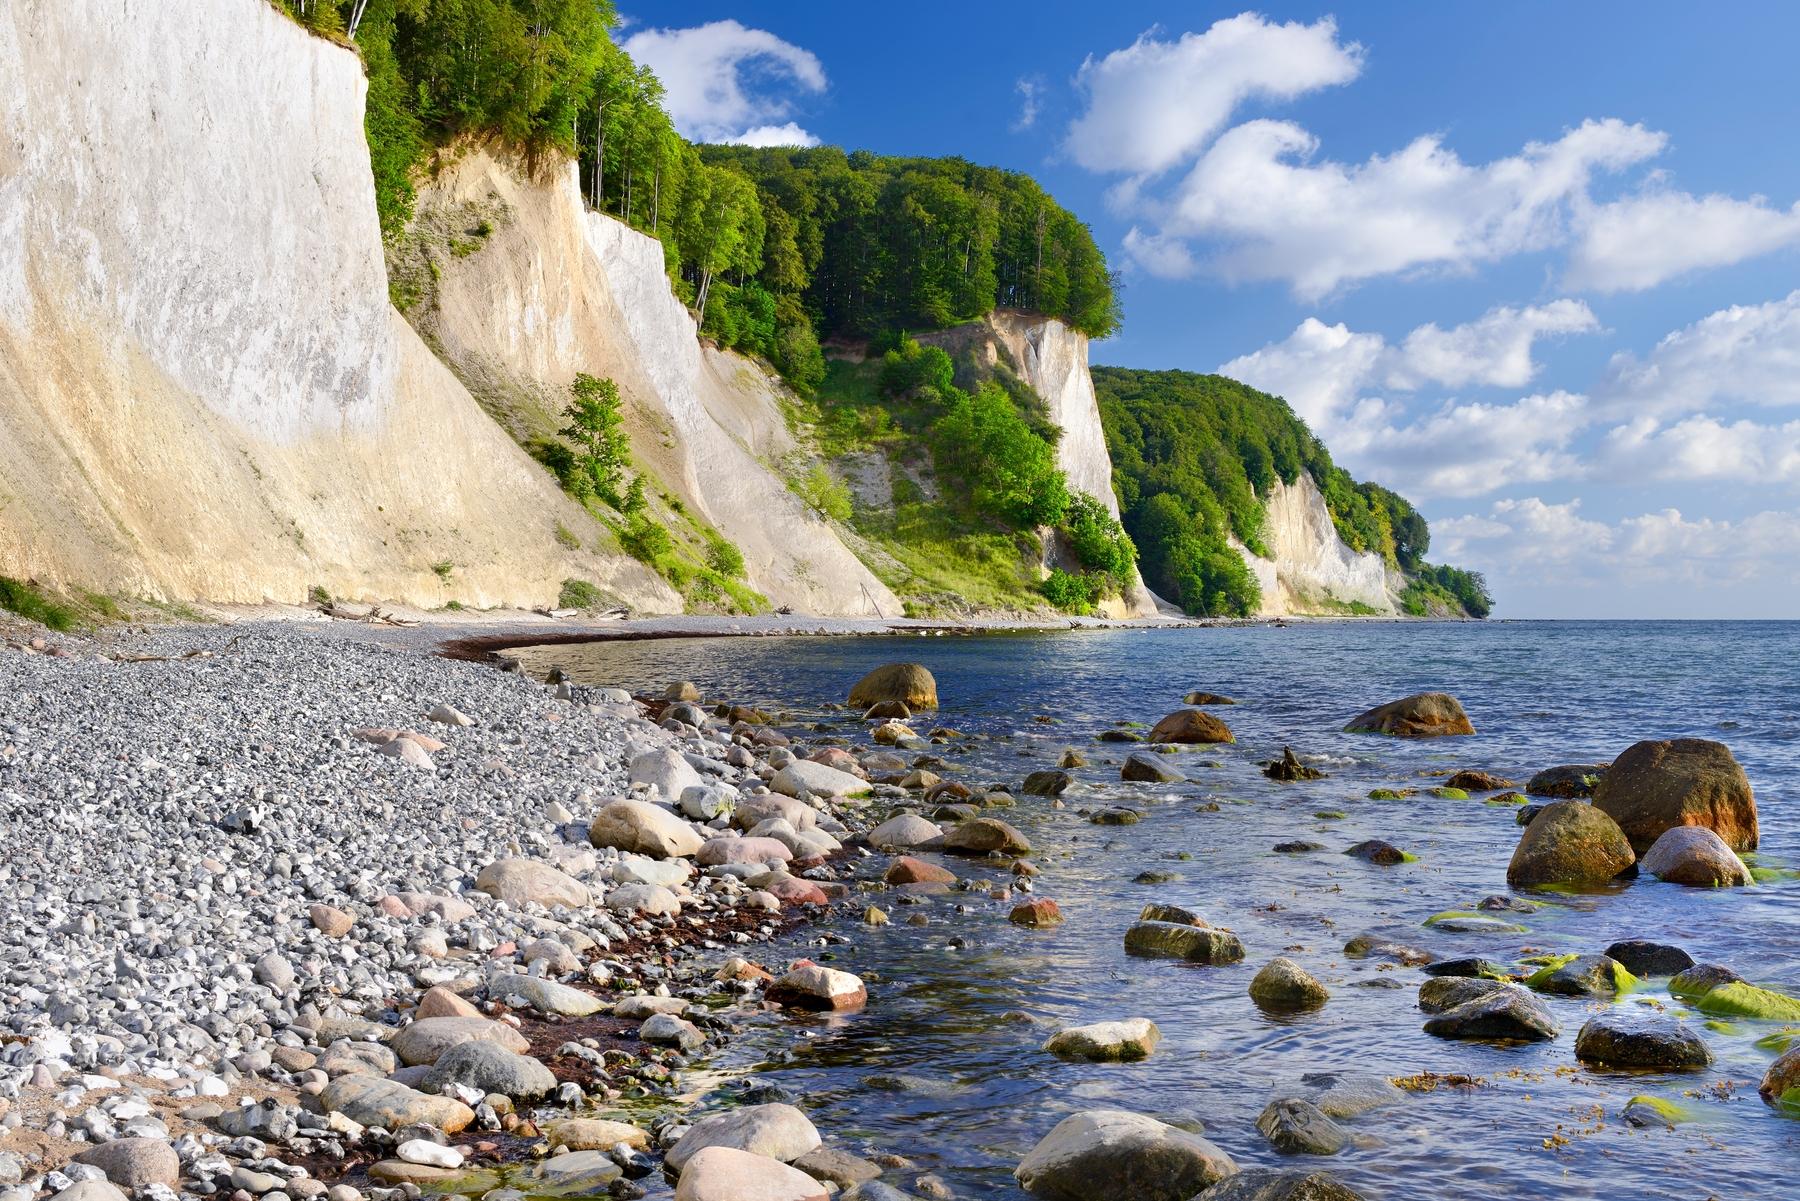 Natuur in Duitsland: Nationaal Park Jasmund, Mecklenburg-Vorpommern